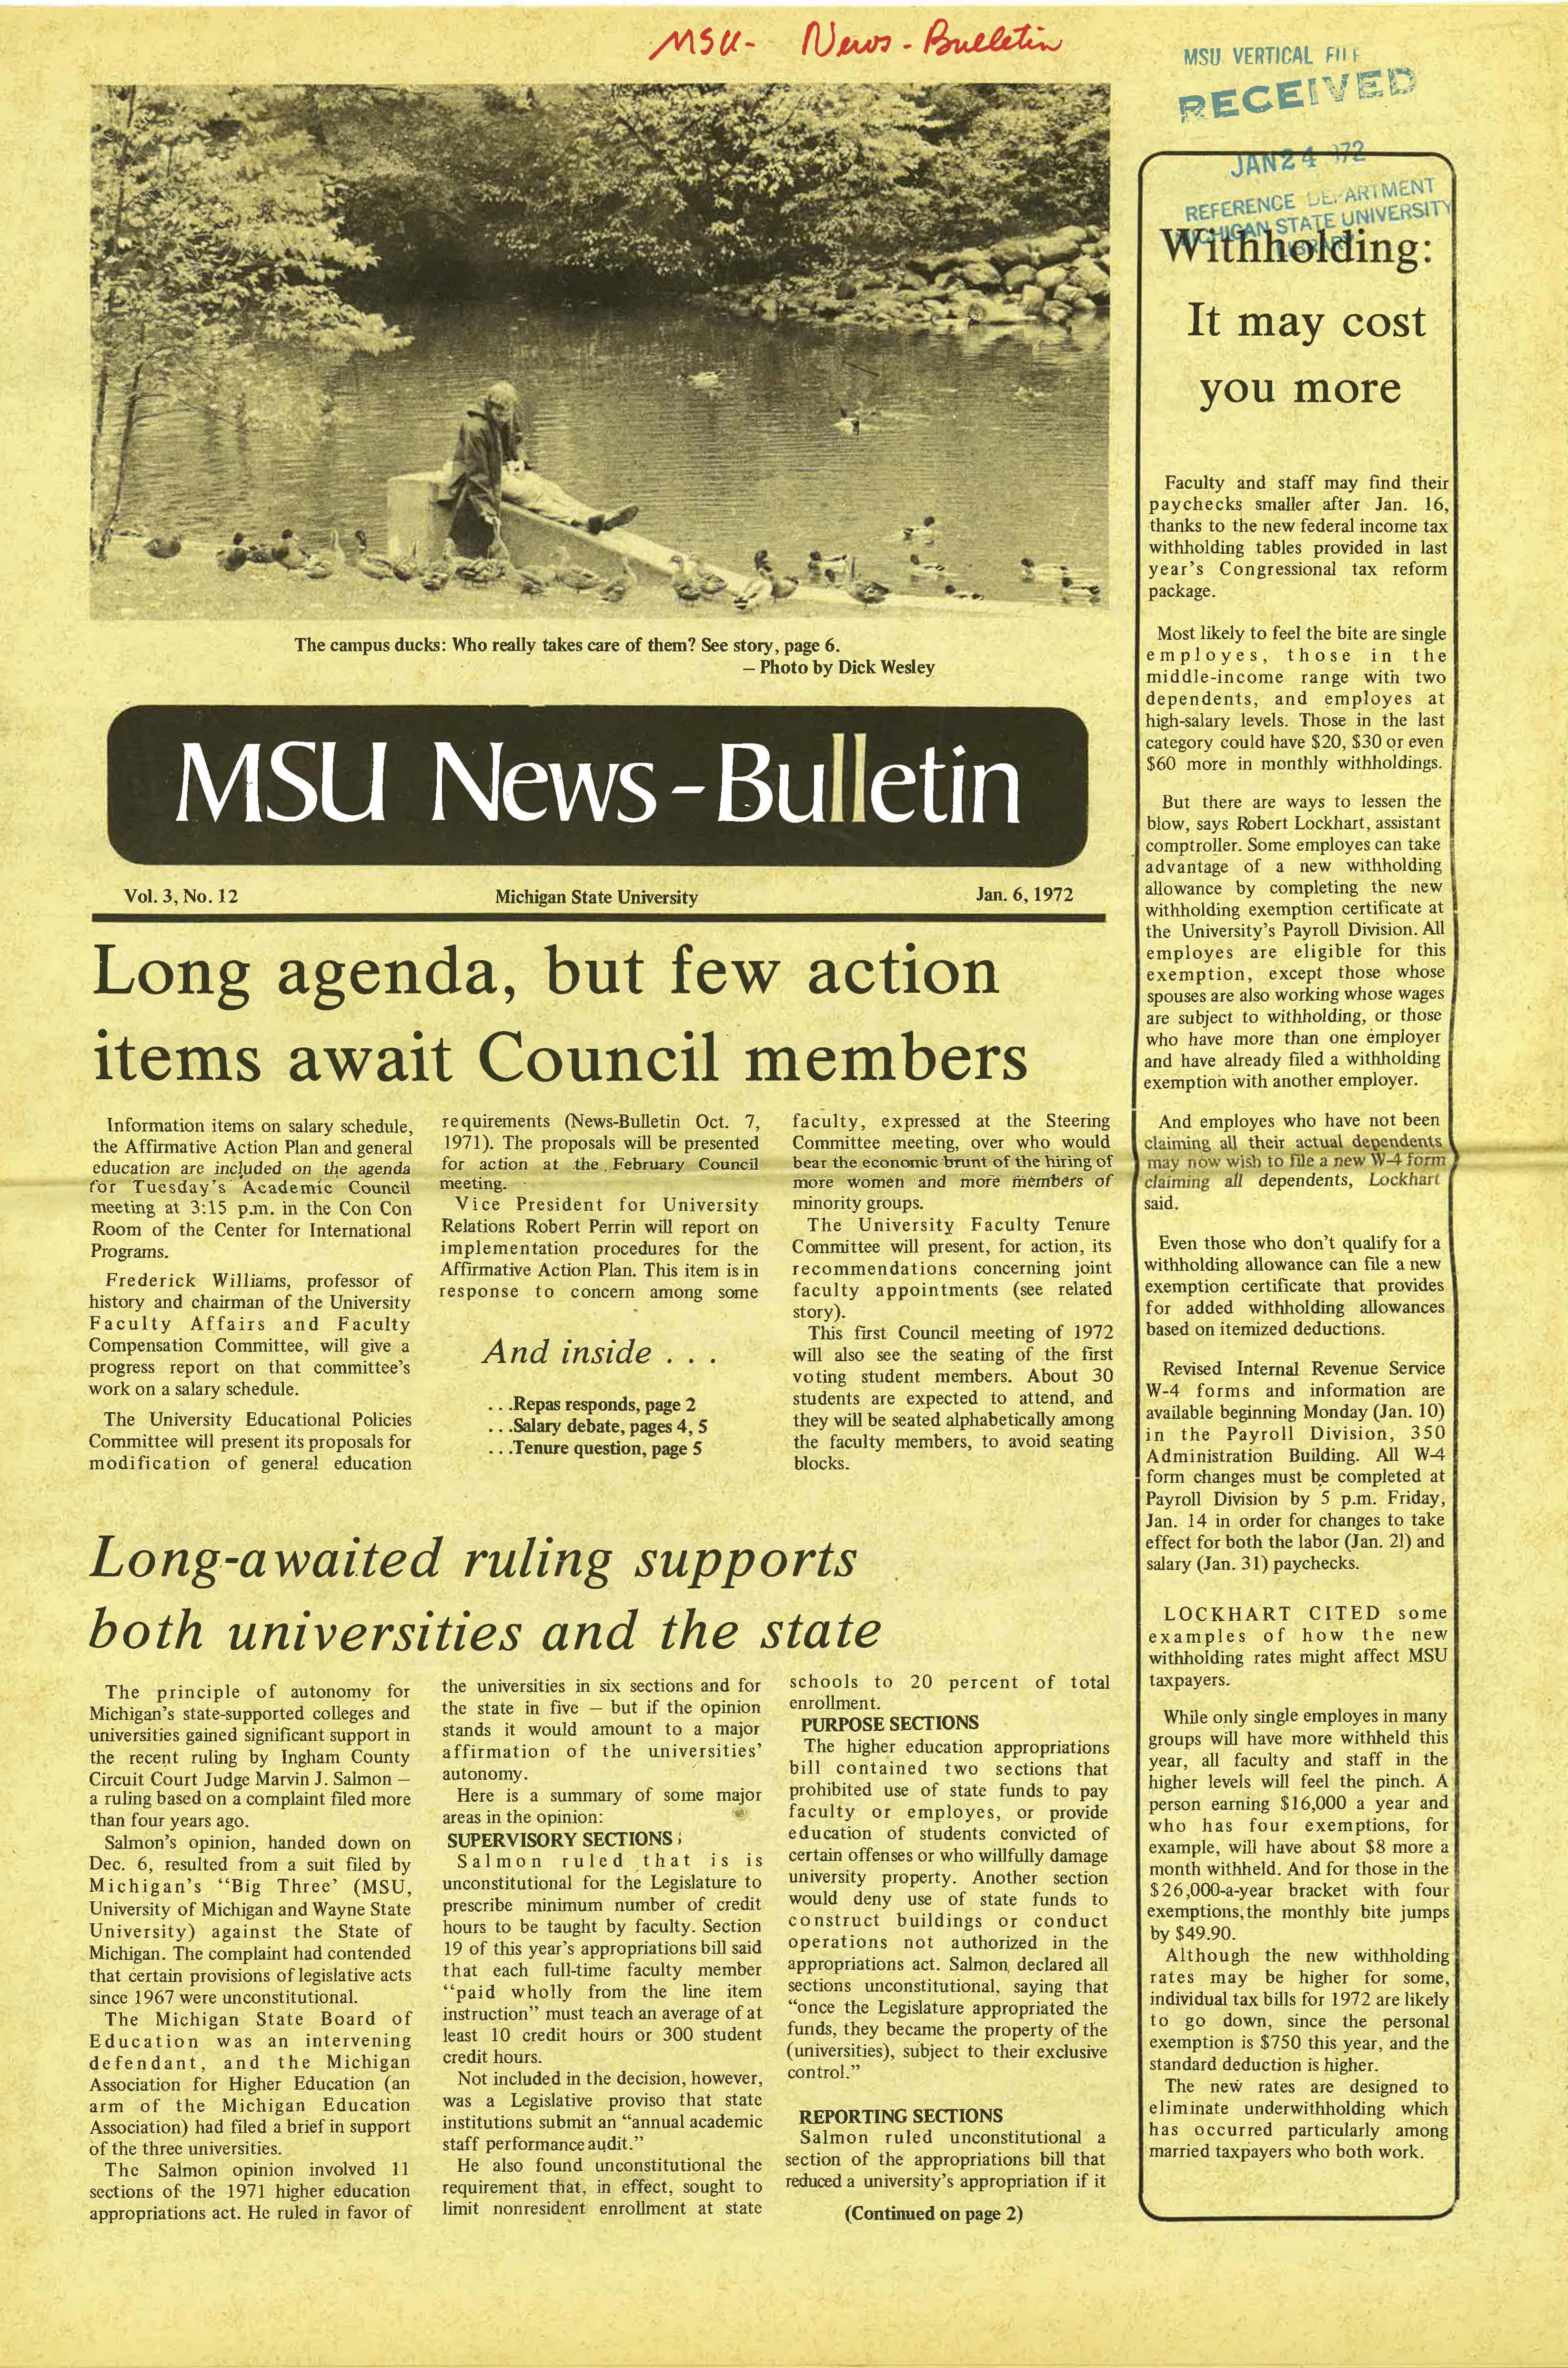 MSU News Bulletin, vol. 3, No. 17, February 10, 1972